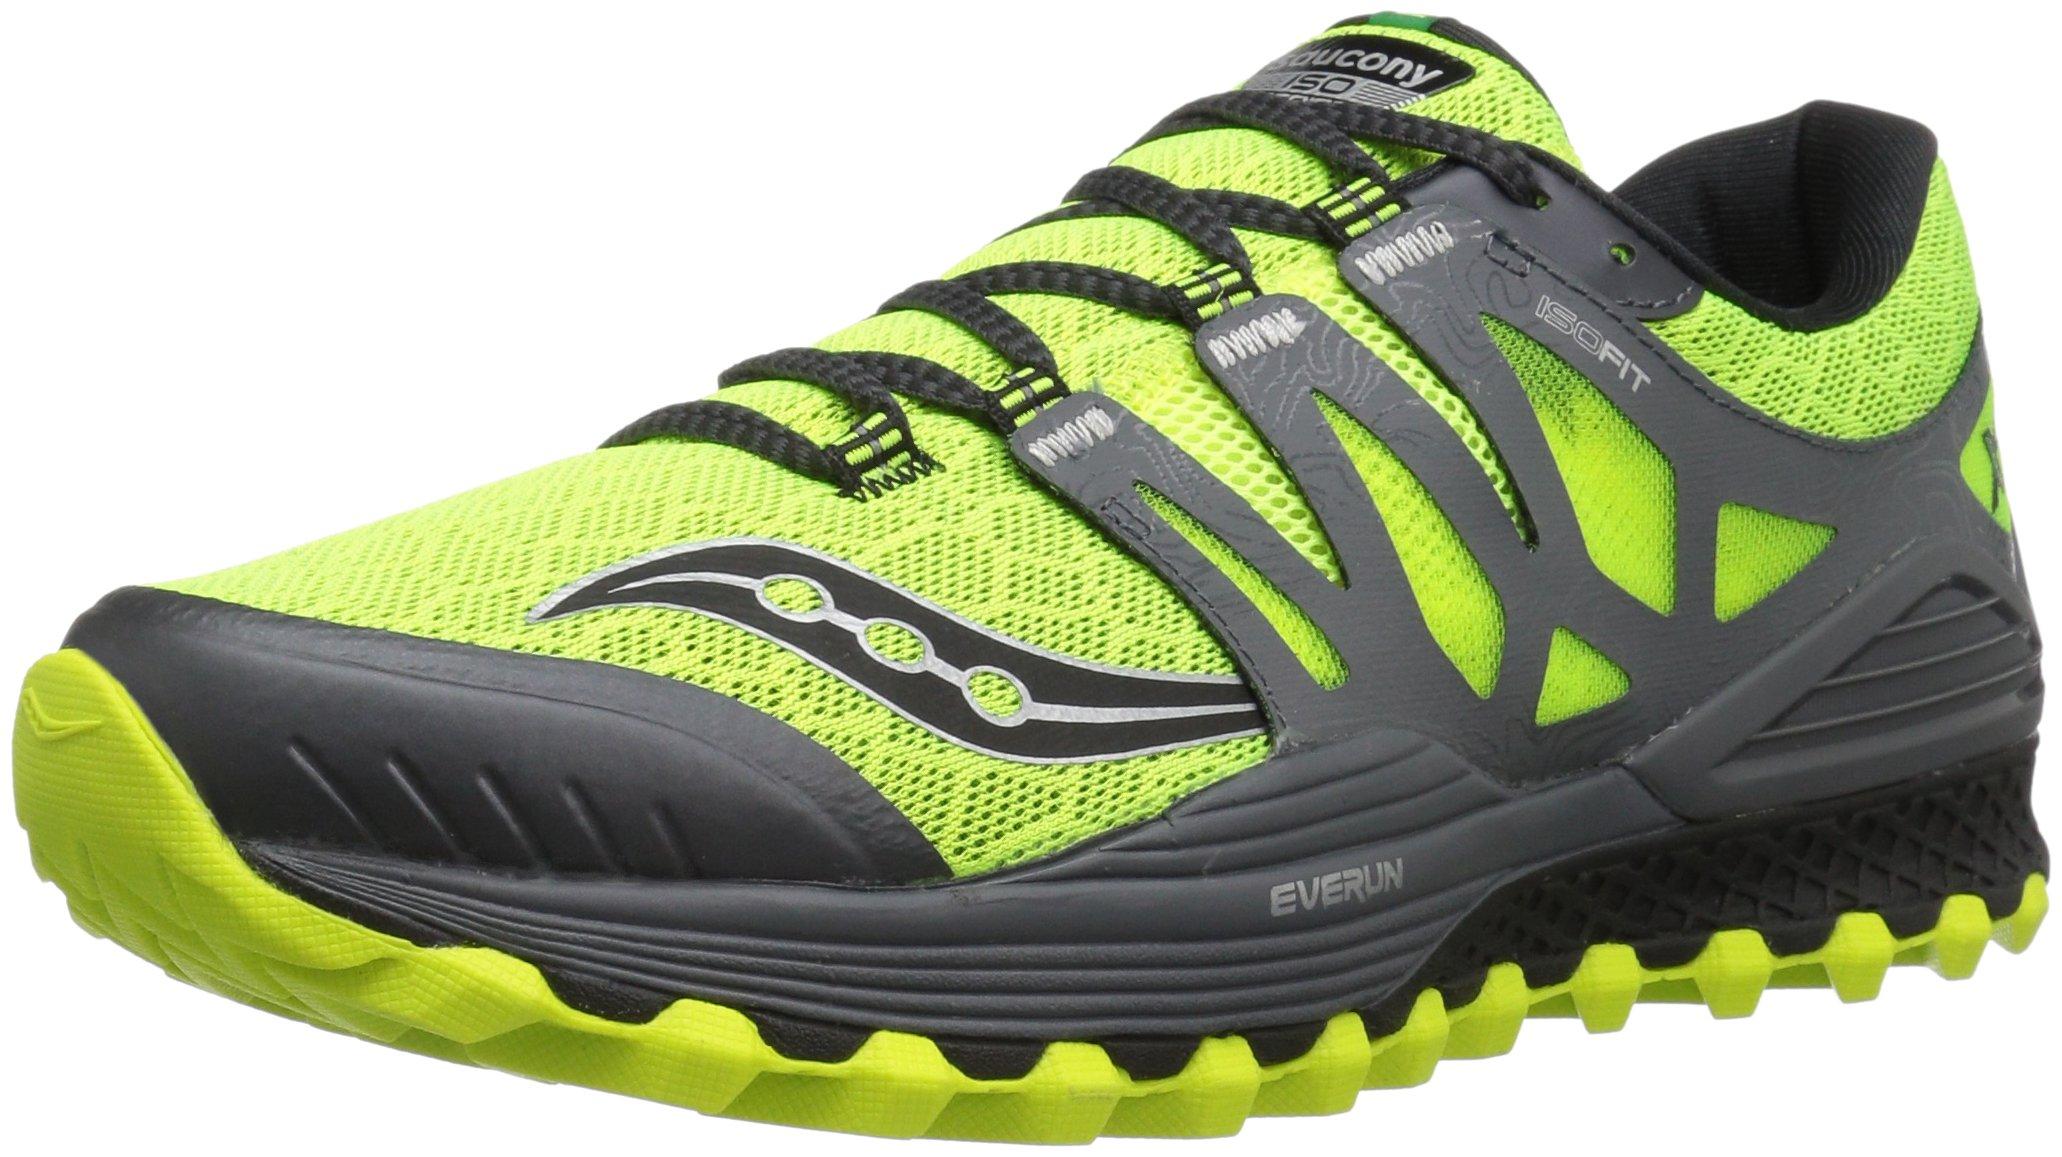 Saucony Men's Xodus Iso Trail Runner, Cotton/Grey, 7.5 M US